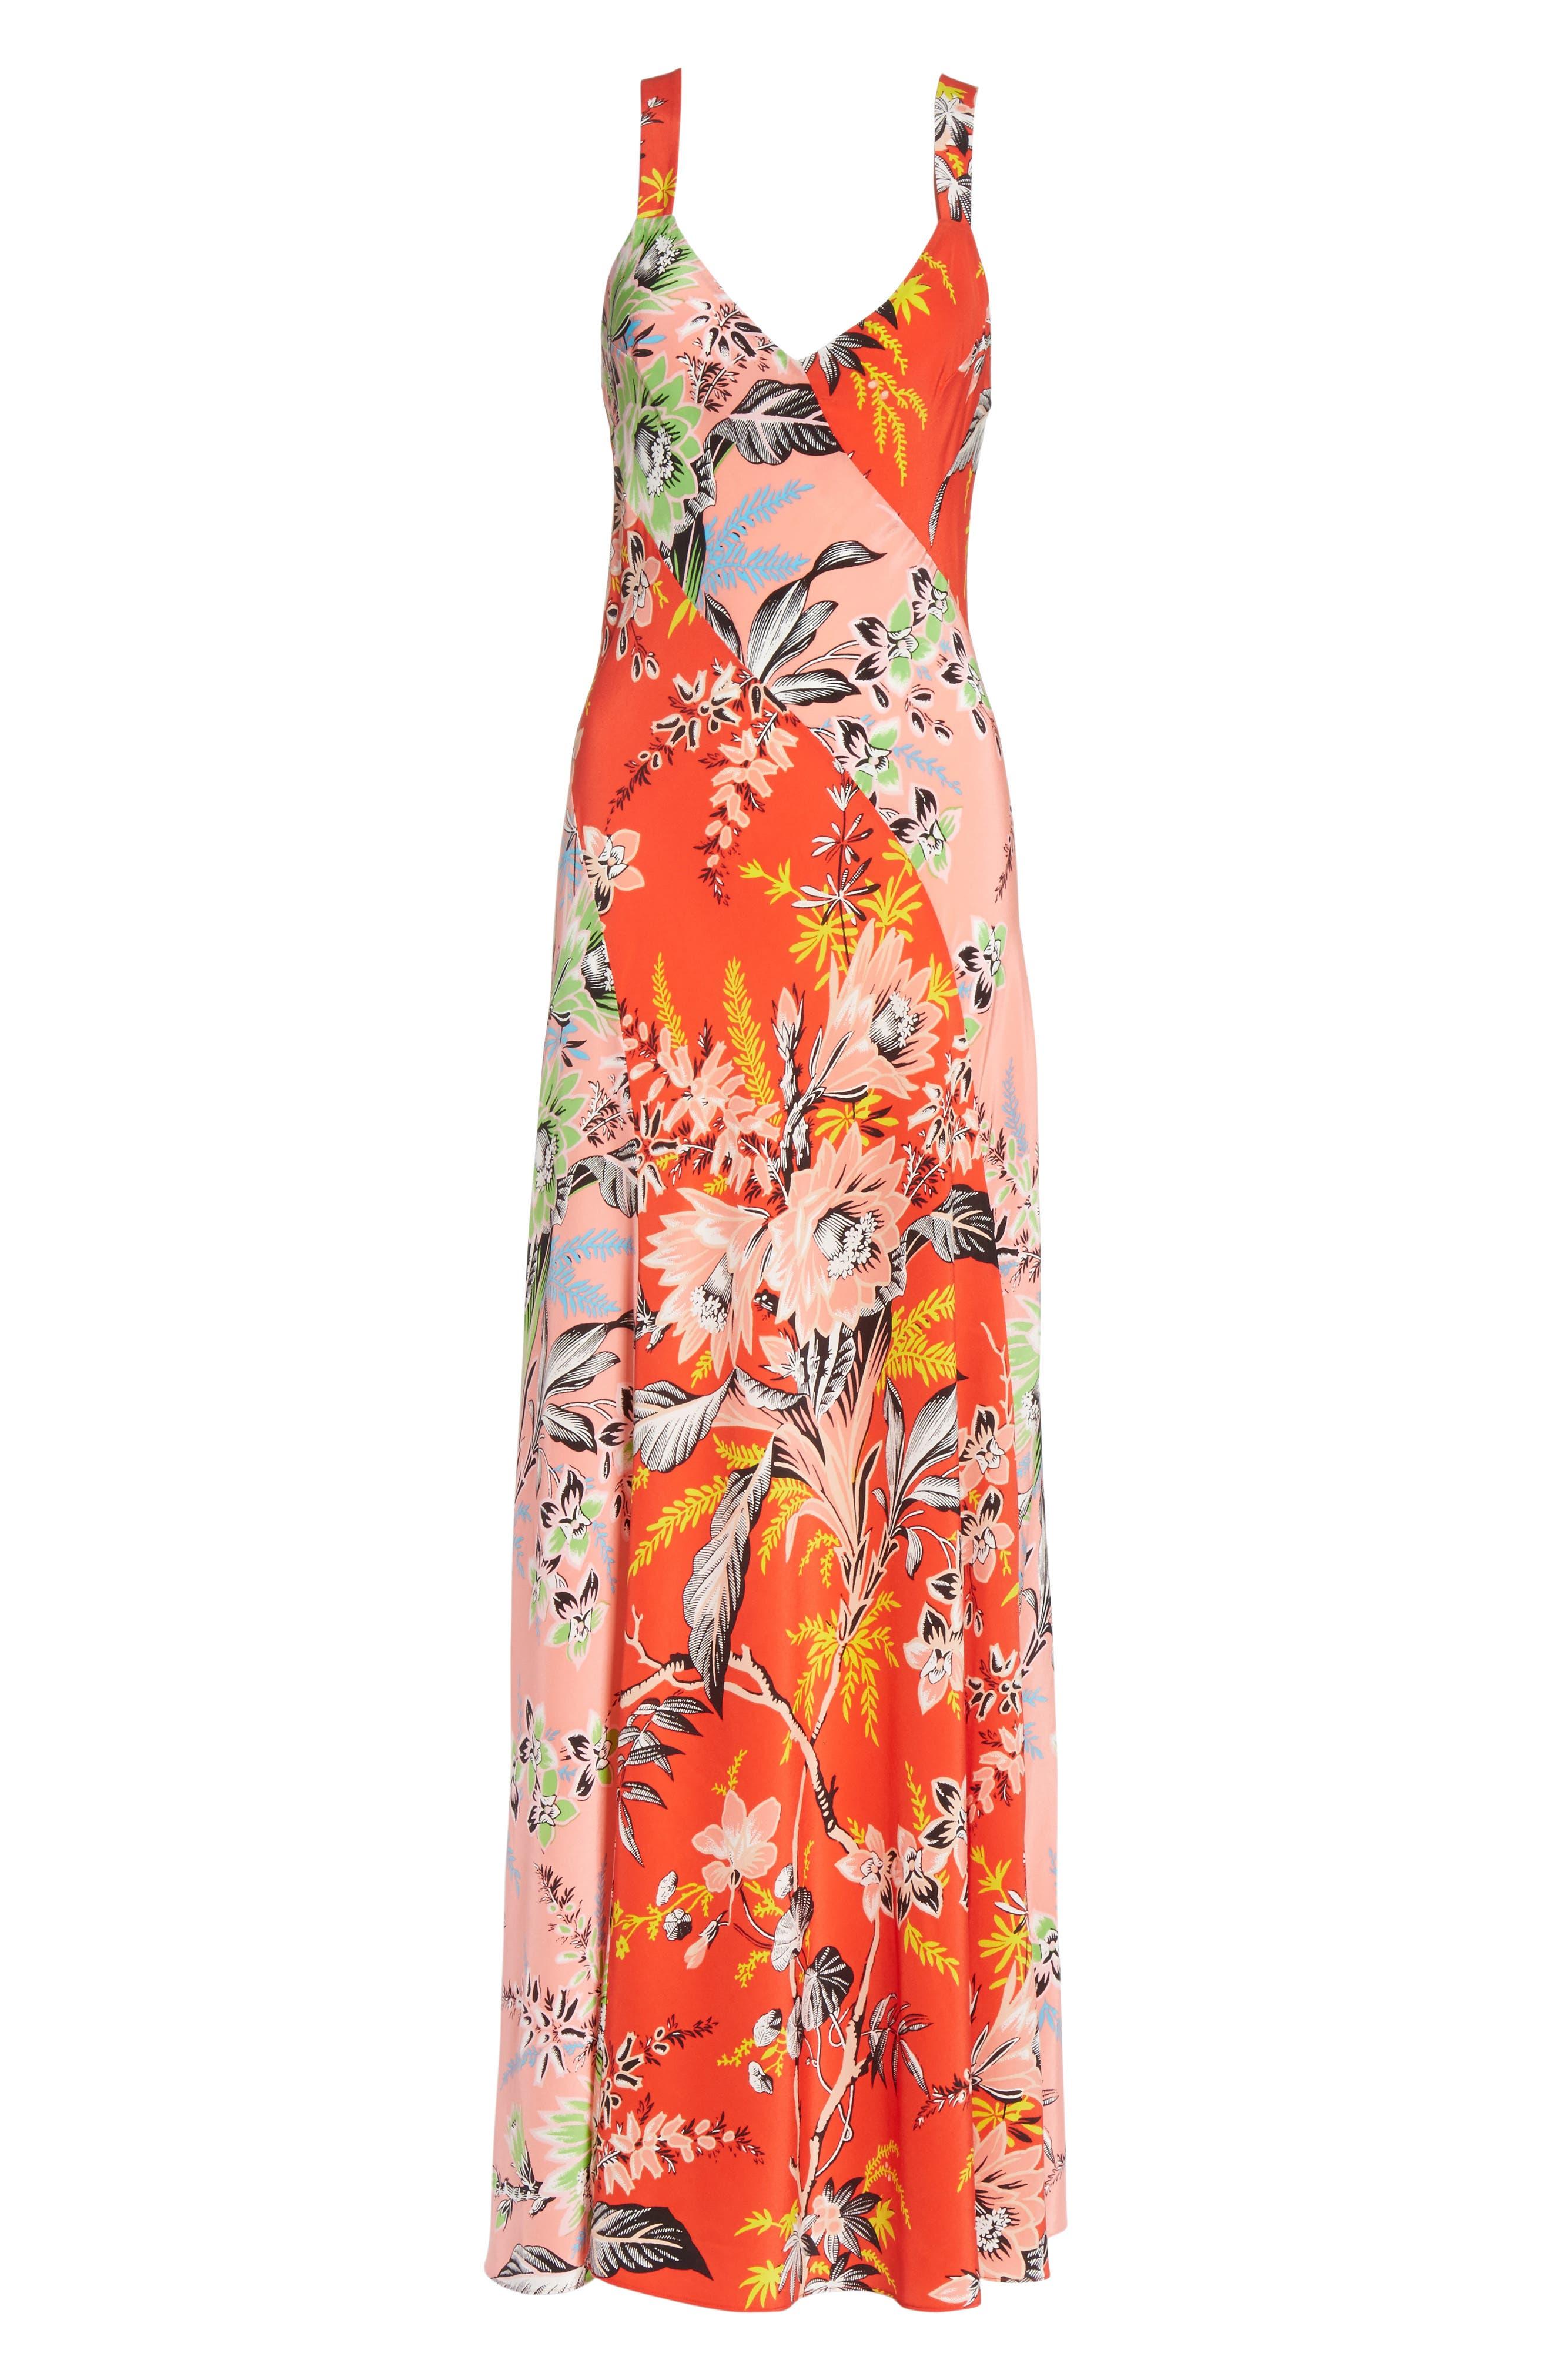 Diane von Furstenberg Paneled Silk Maxi Dress,                             Alternate thumbnail 6, color,                             Avalon Poppy/ Avalon Hyacinth